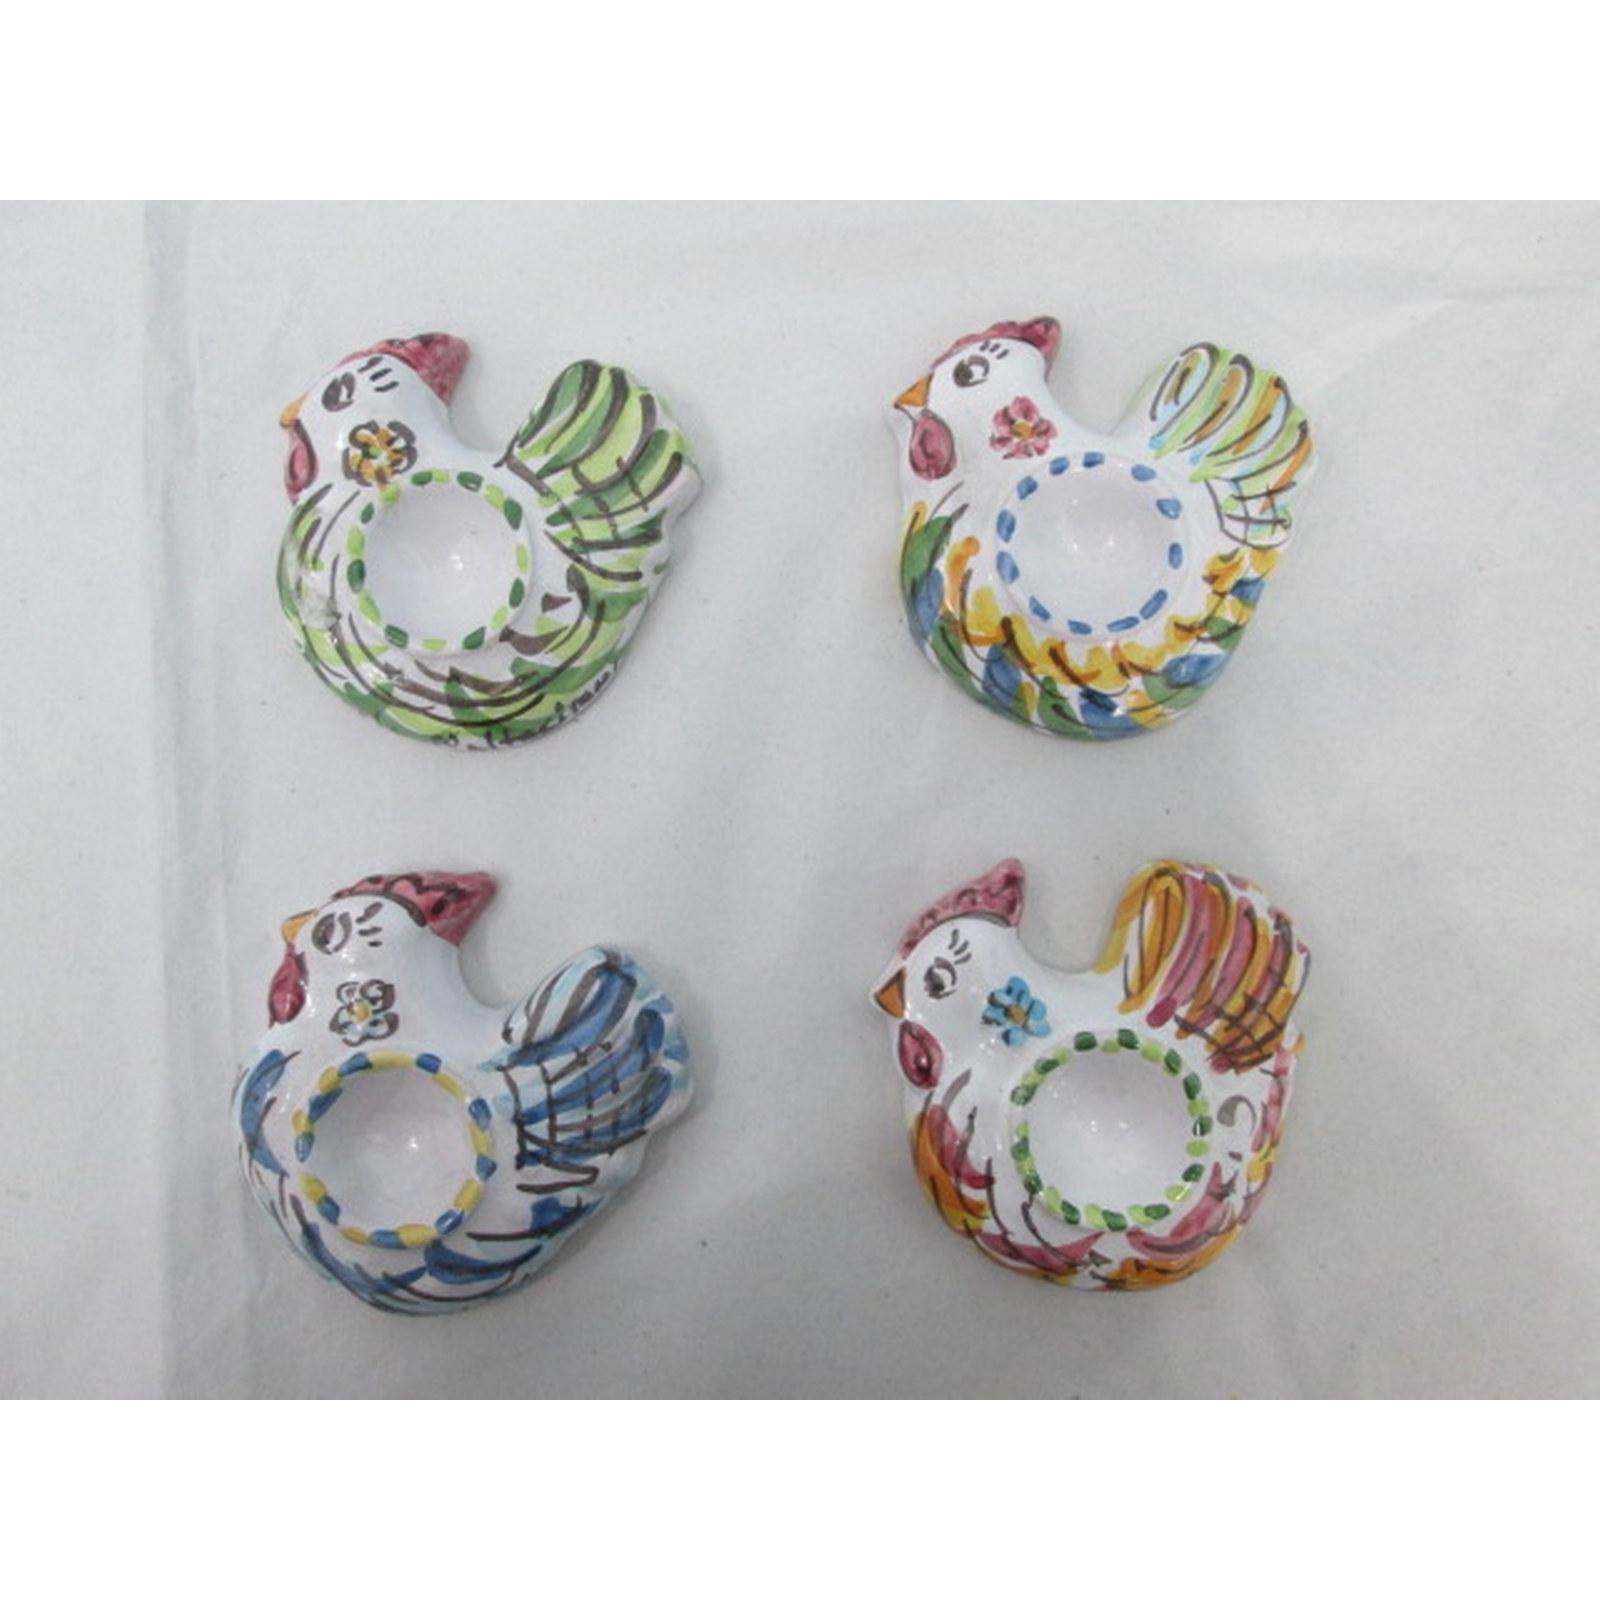 Porta uova in vari colori in ceramica di caltagirone for Porta uova